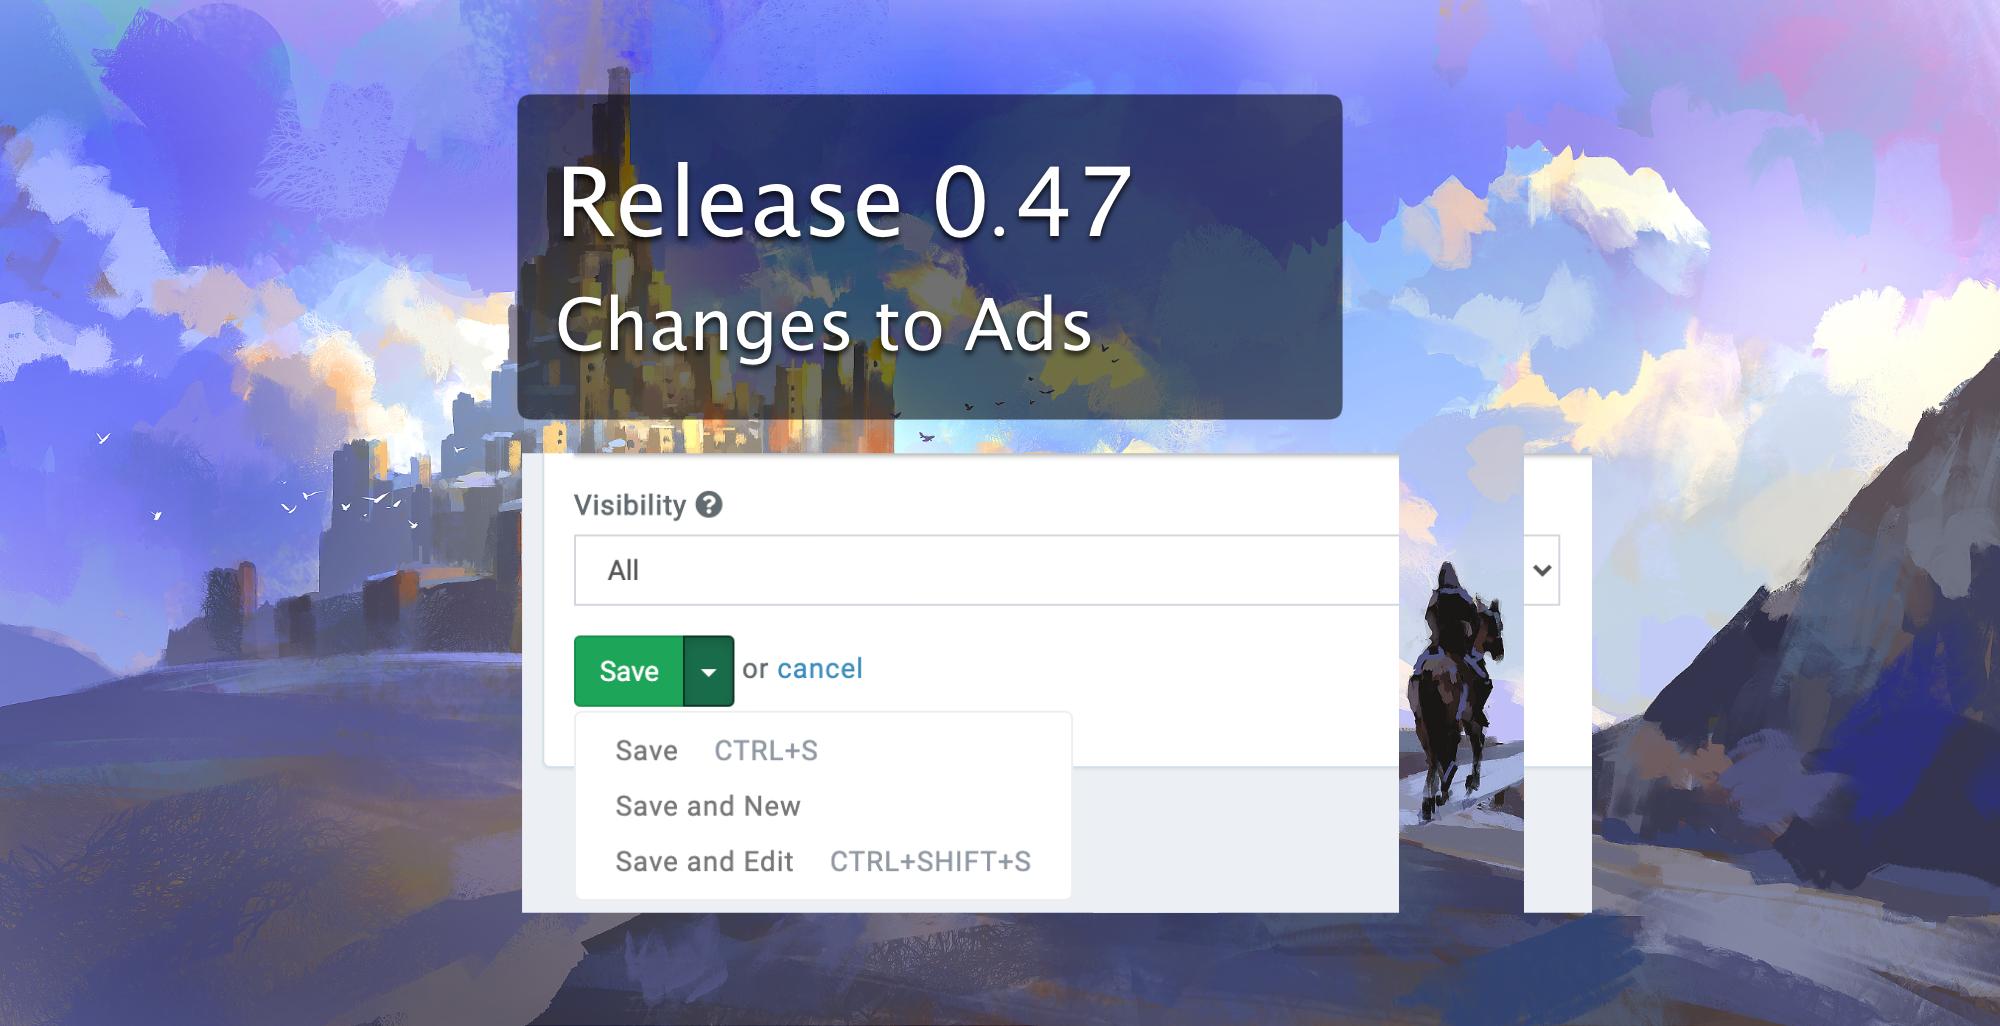 Kanka release 0.47